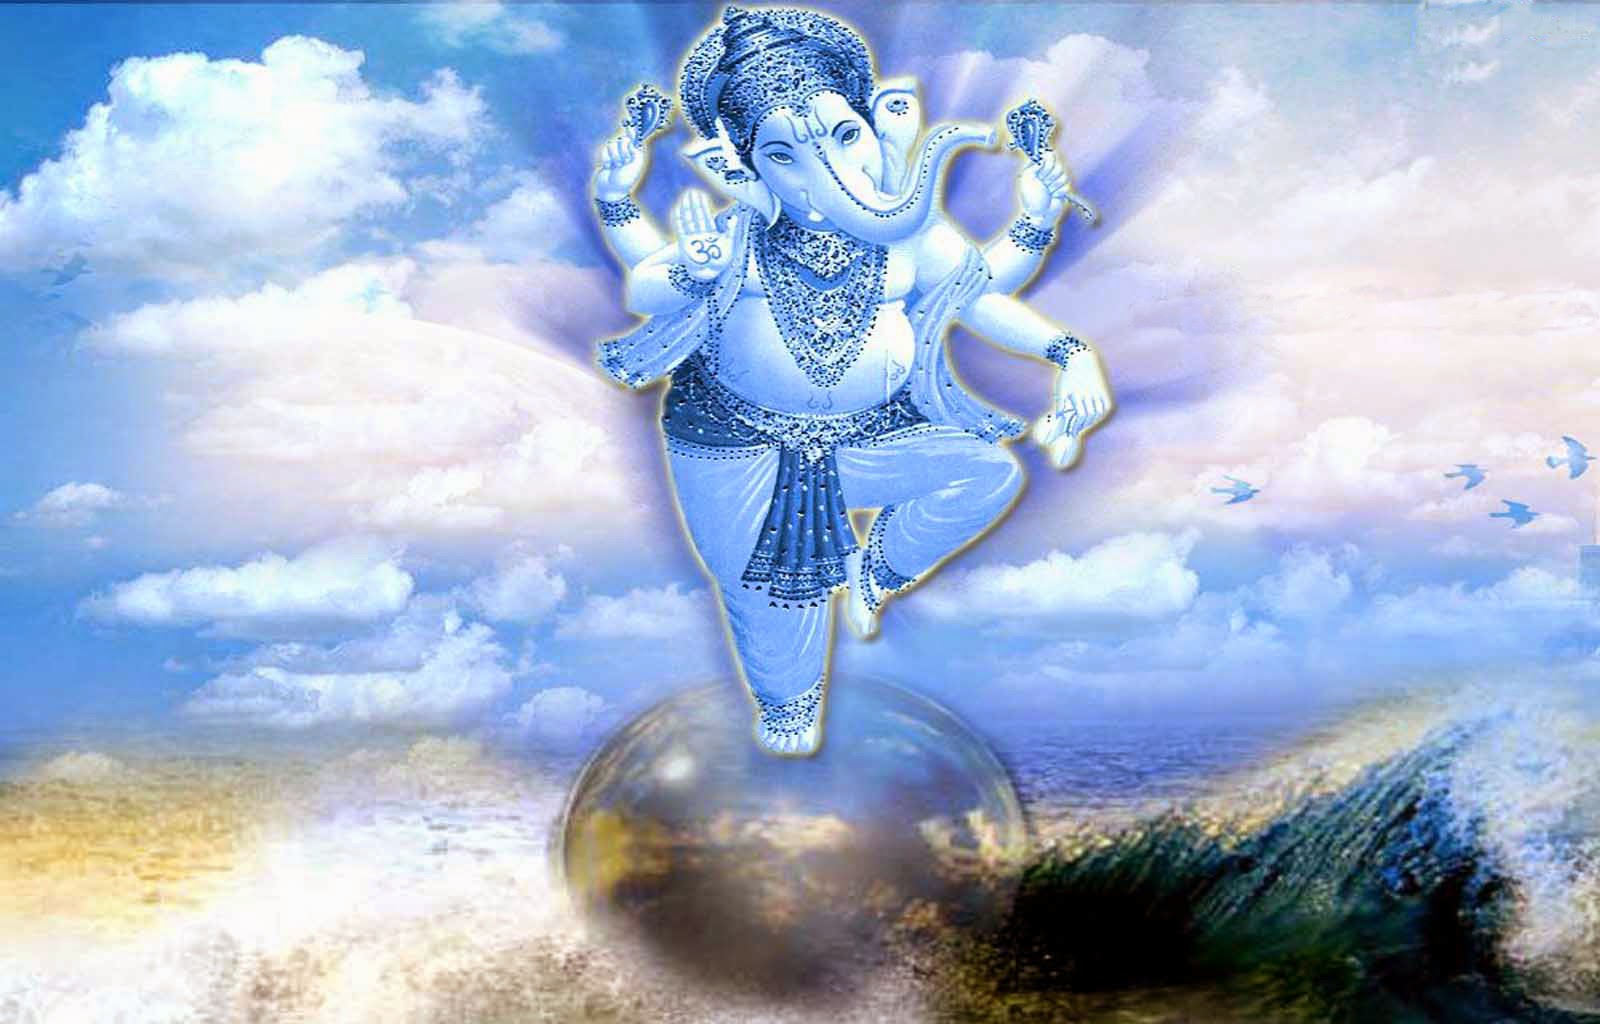 Aarti 3d Name Wallpaper Hd Wallpapers Hdwallpapers Org In Lord Vigneswara